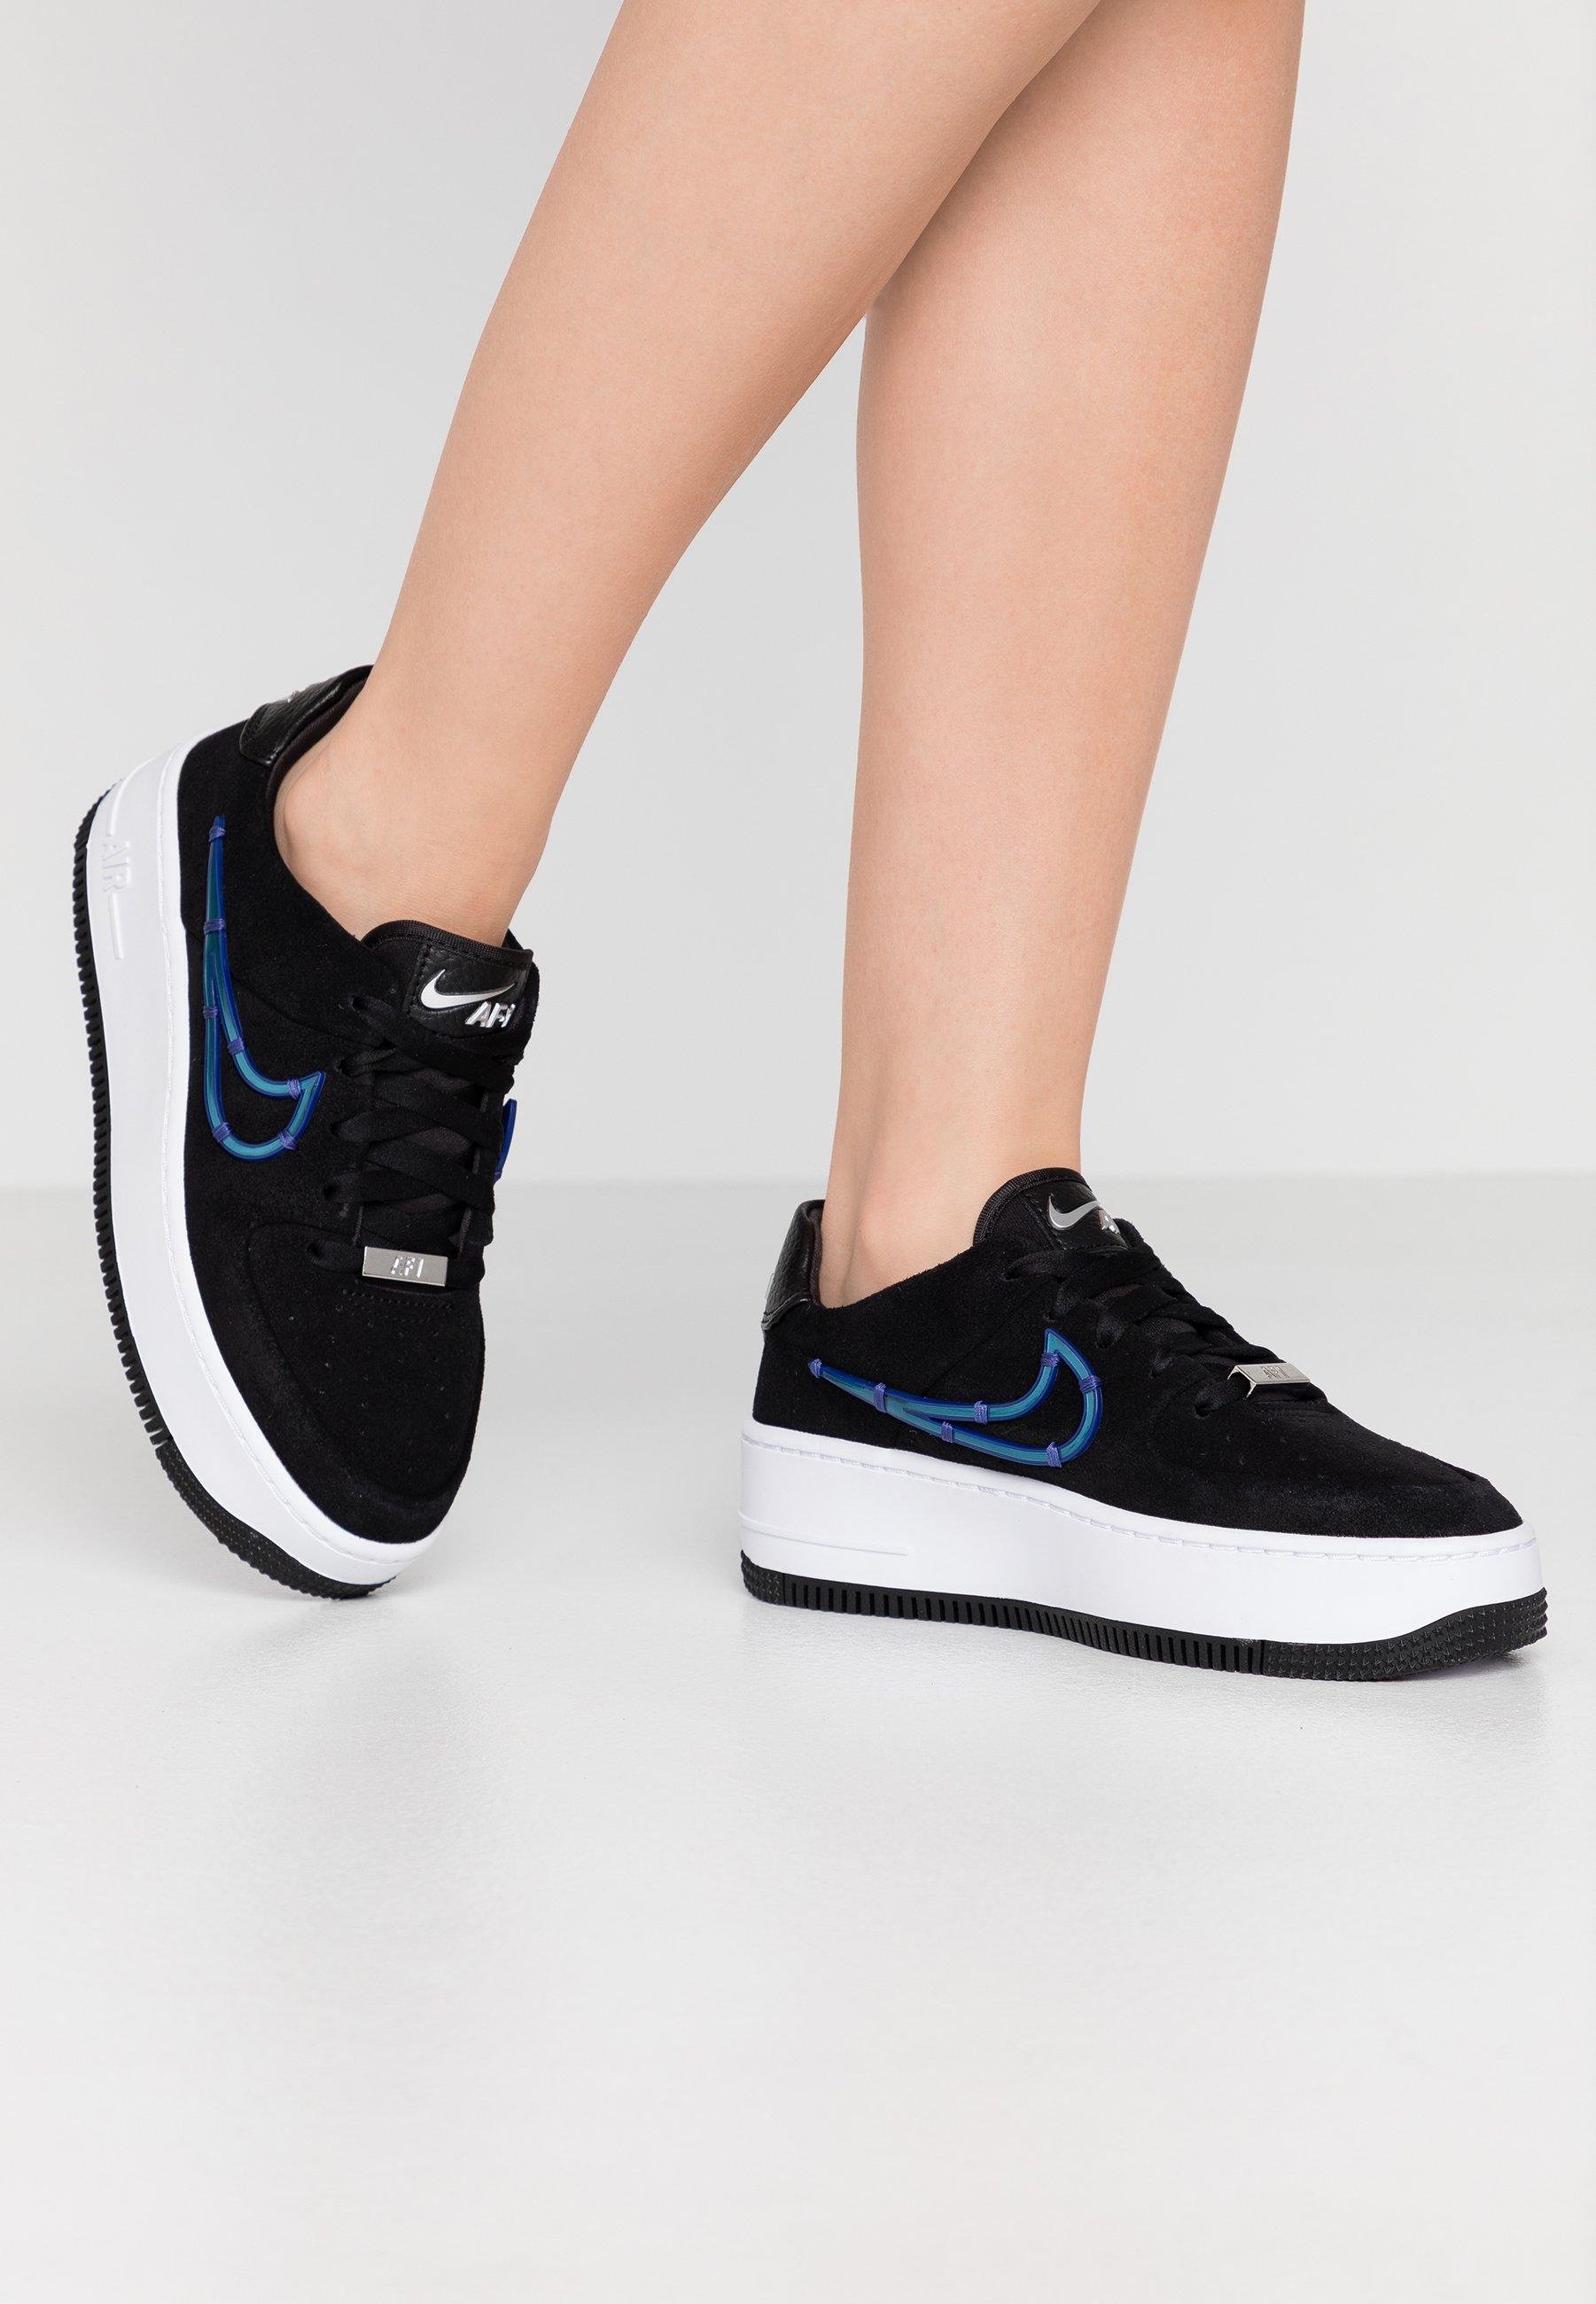 Nike Sportswear Air Force 1 Sage Sneakers Laag Black Deep Royal Blue Metallic Silver Zwart Zalando Be Nike air force 1 shadow black light arctic pink claystone red. zalando be